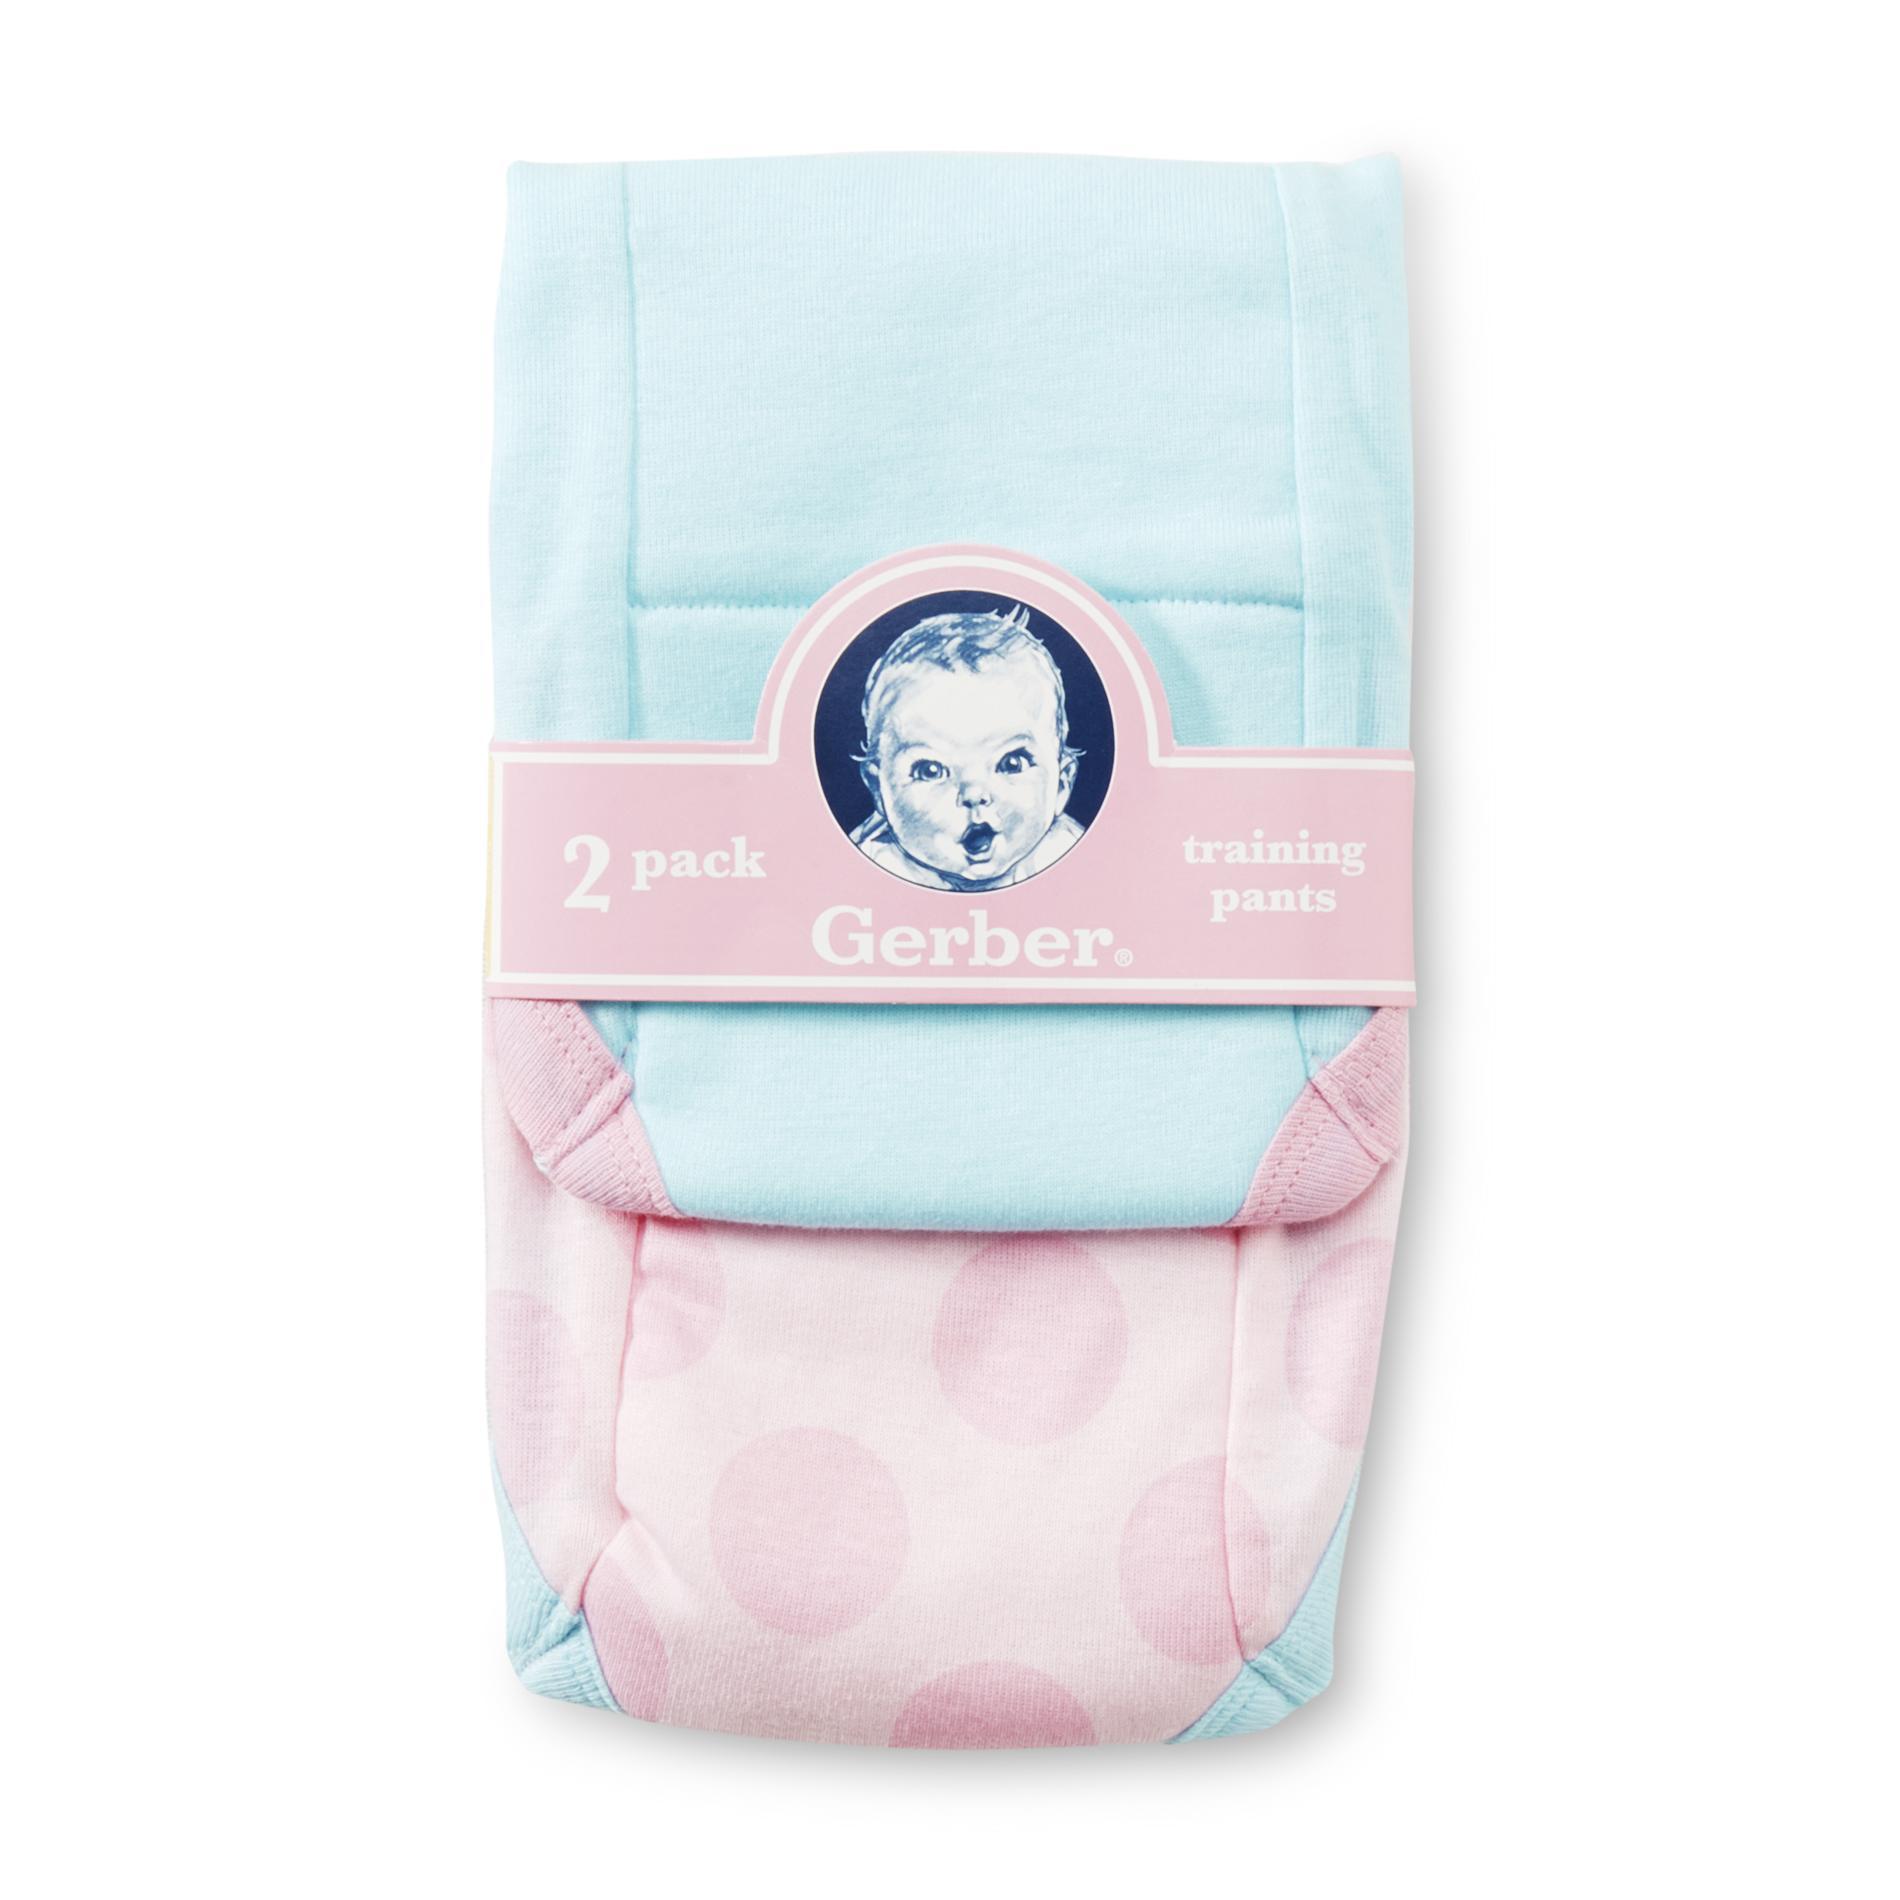 Gerber Toddler Girl's Training Pants - 2-Pack PartNumber: 024VA79349512P MfgPartNumber: 6491822DKG1502T